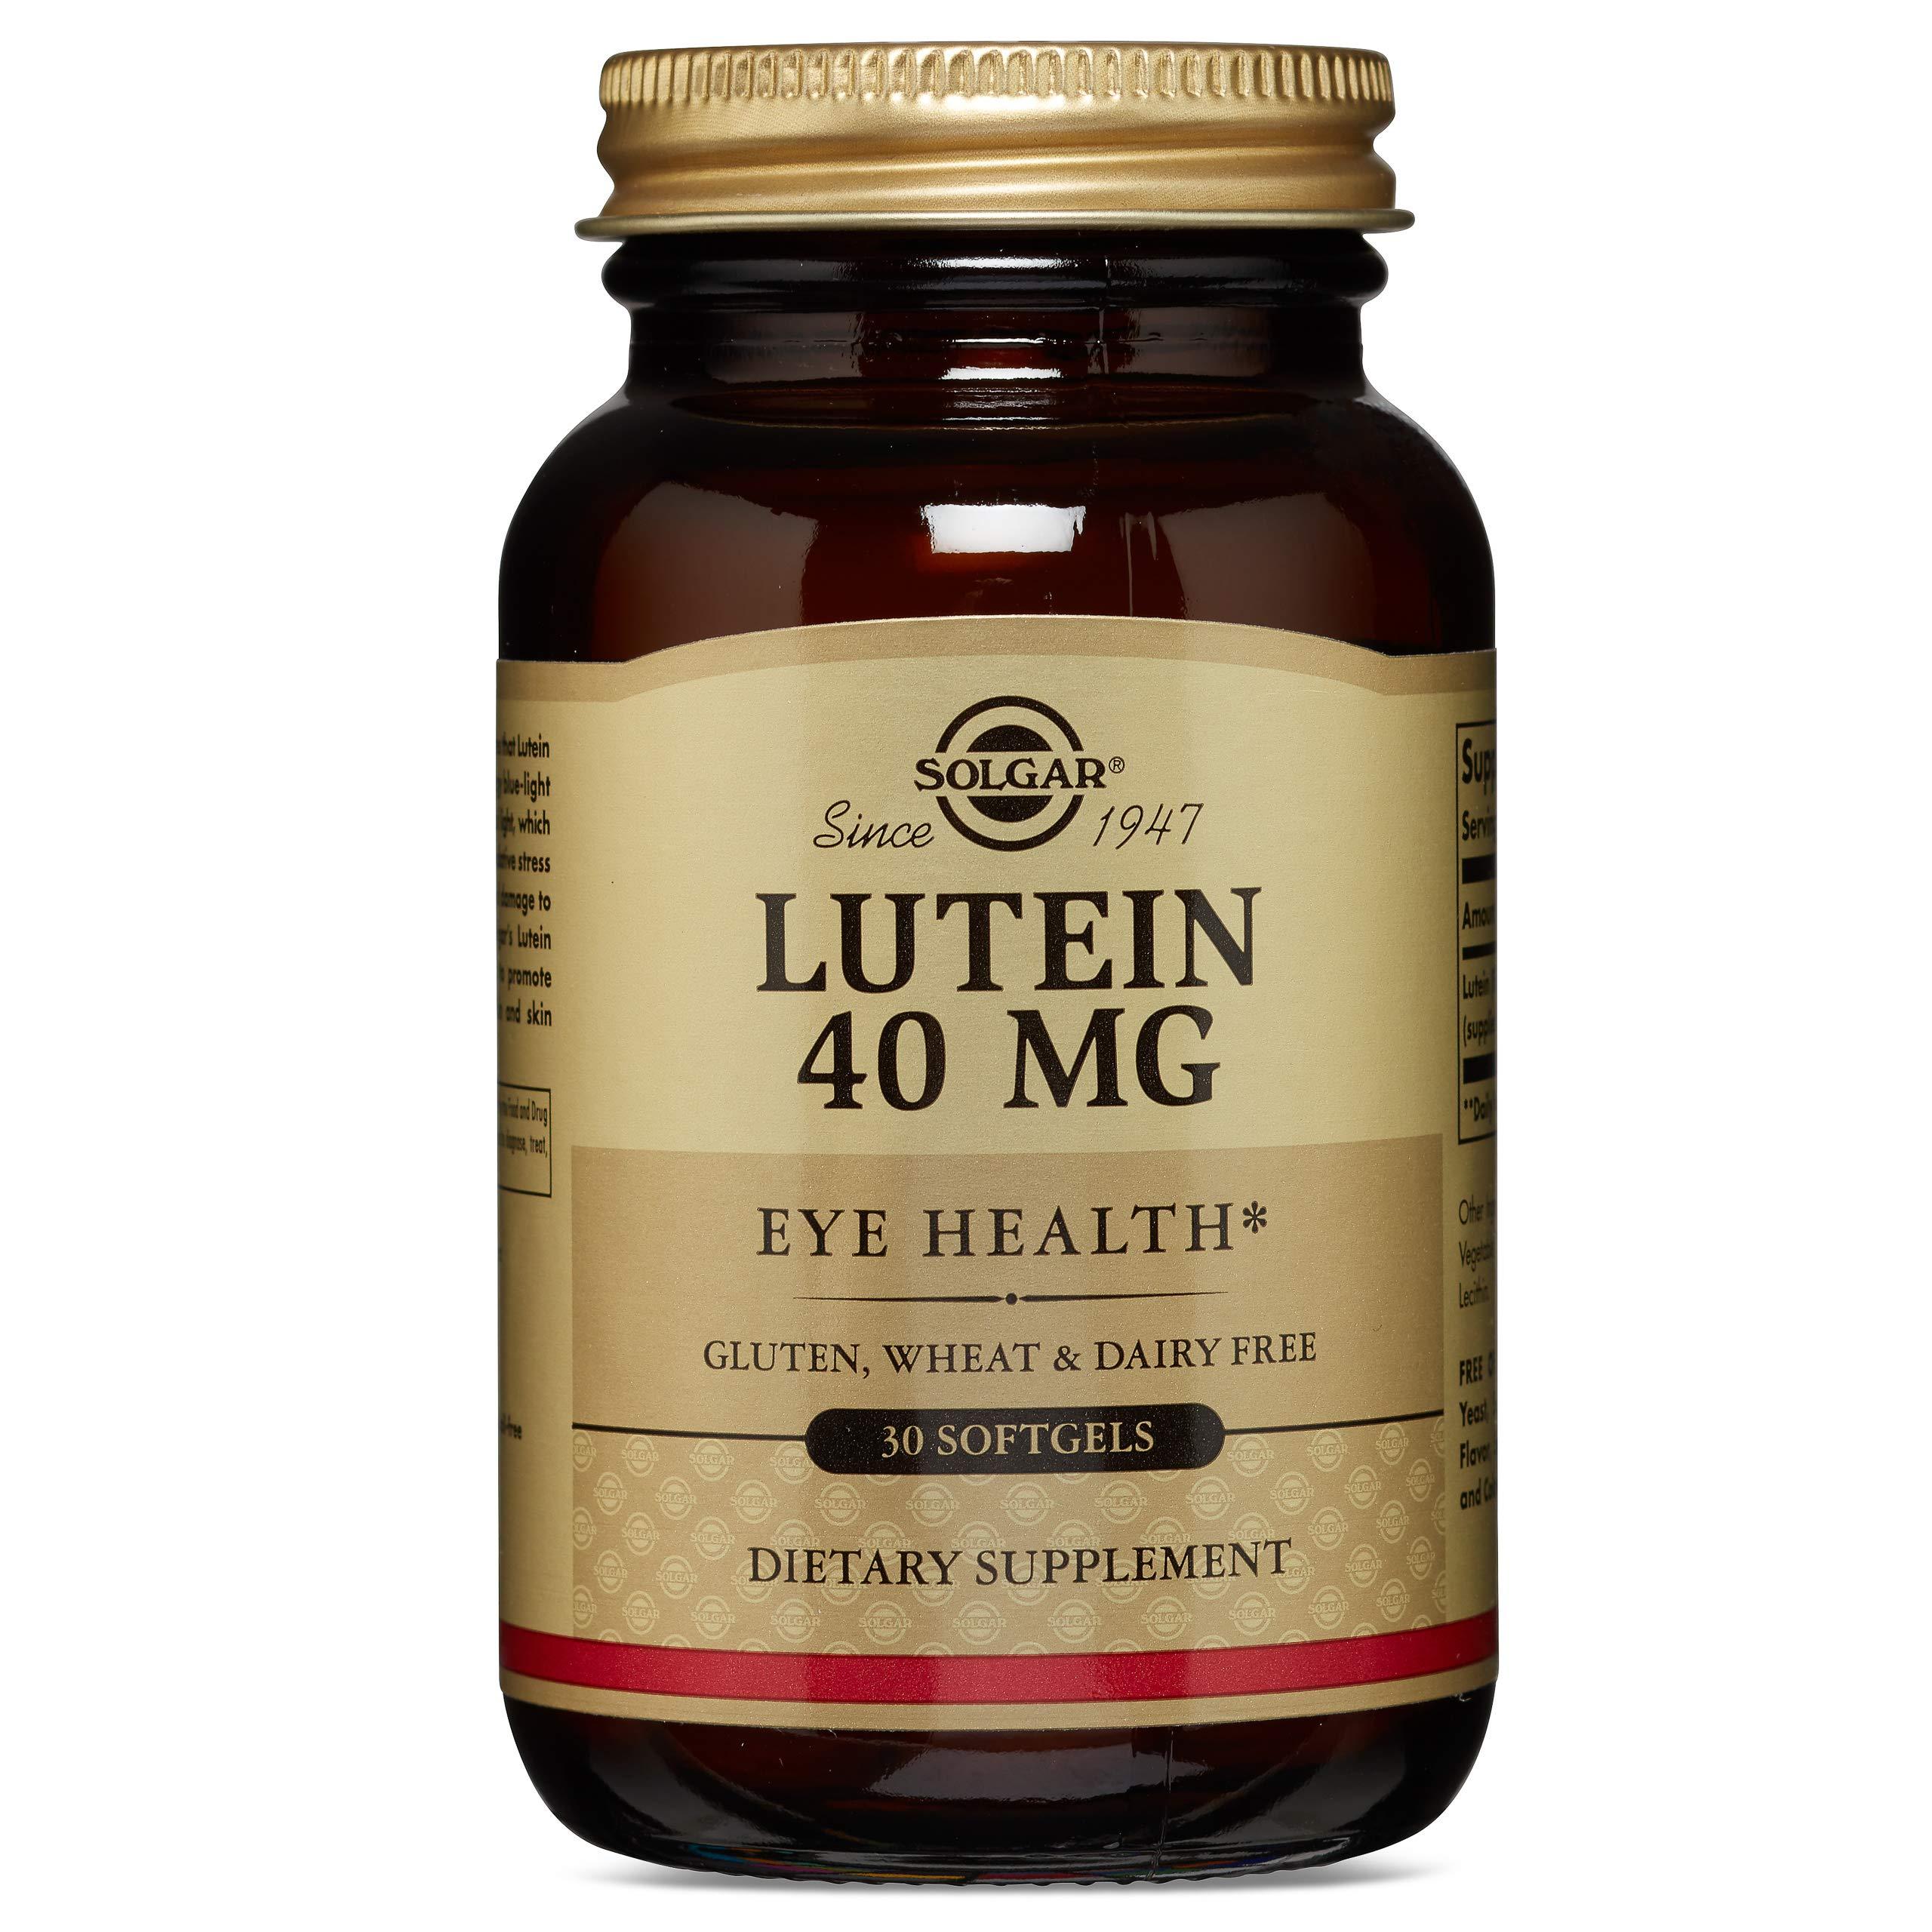 Solgar Lutein 40 mg, 30 Softgels by Solgar